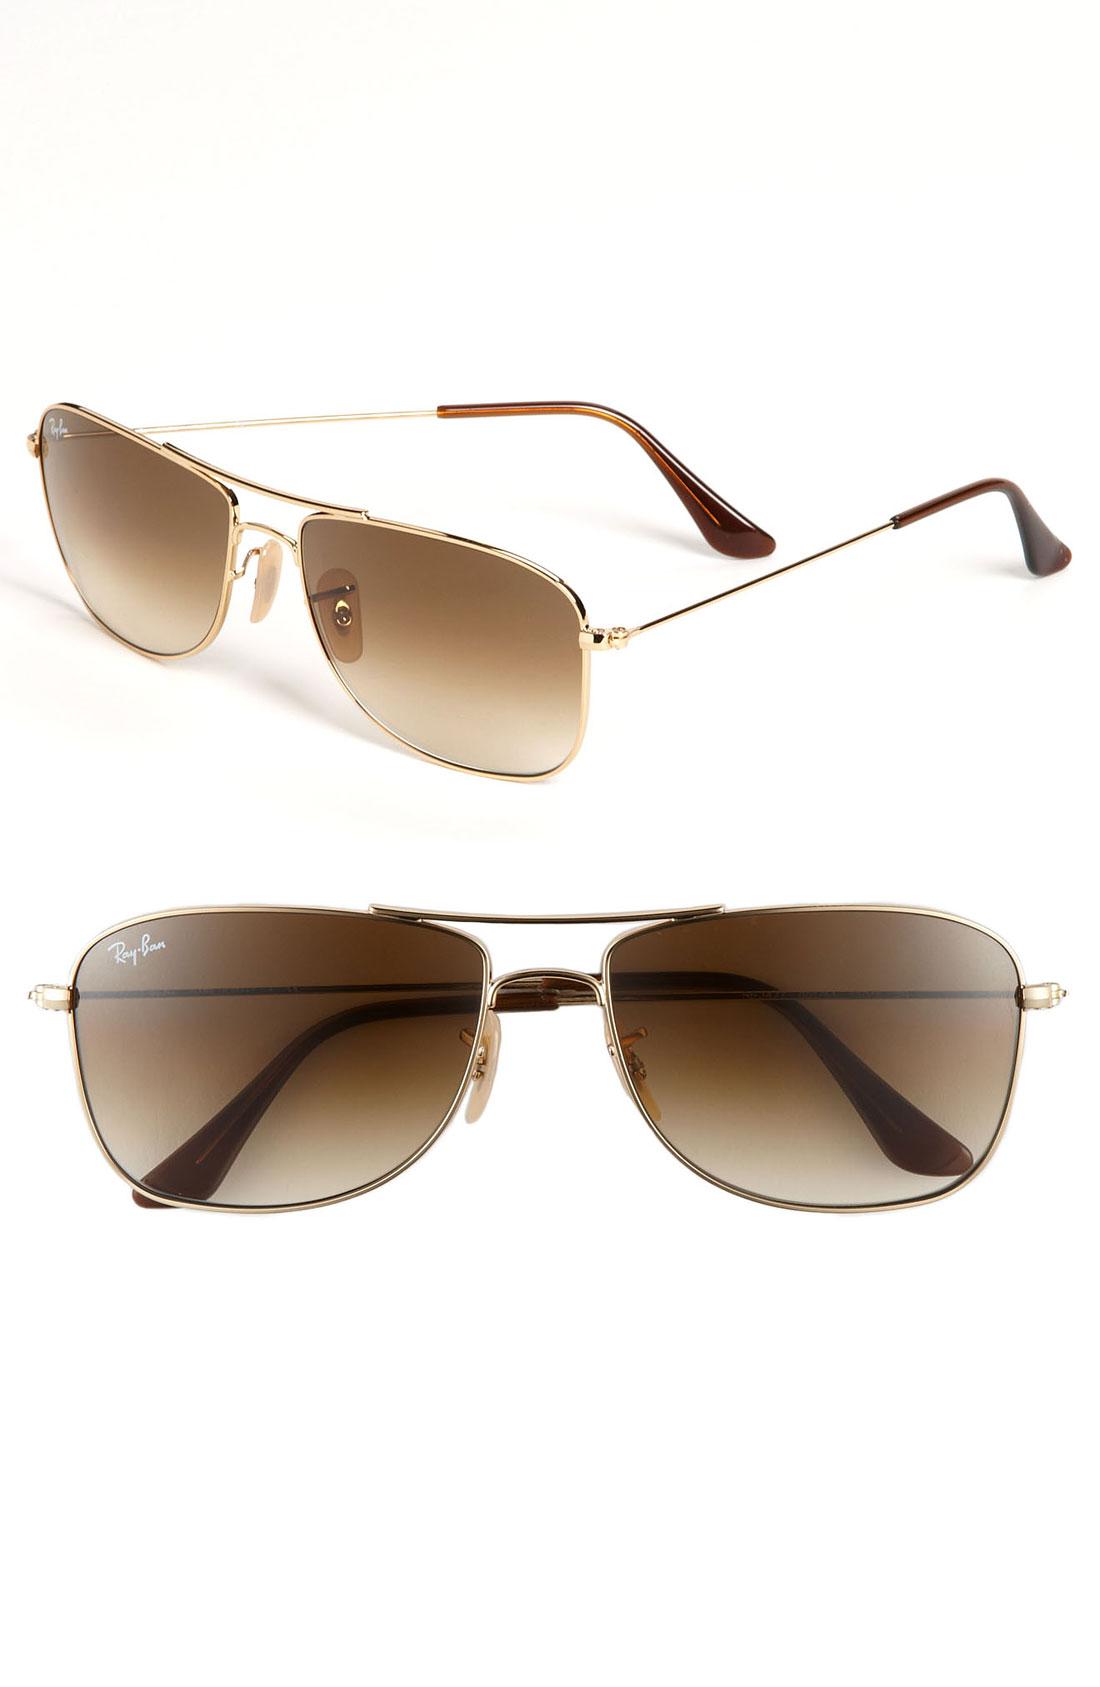 ray ban caravan sunglasses